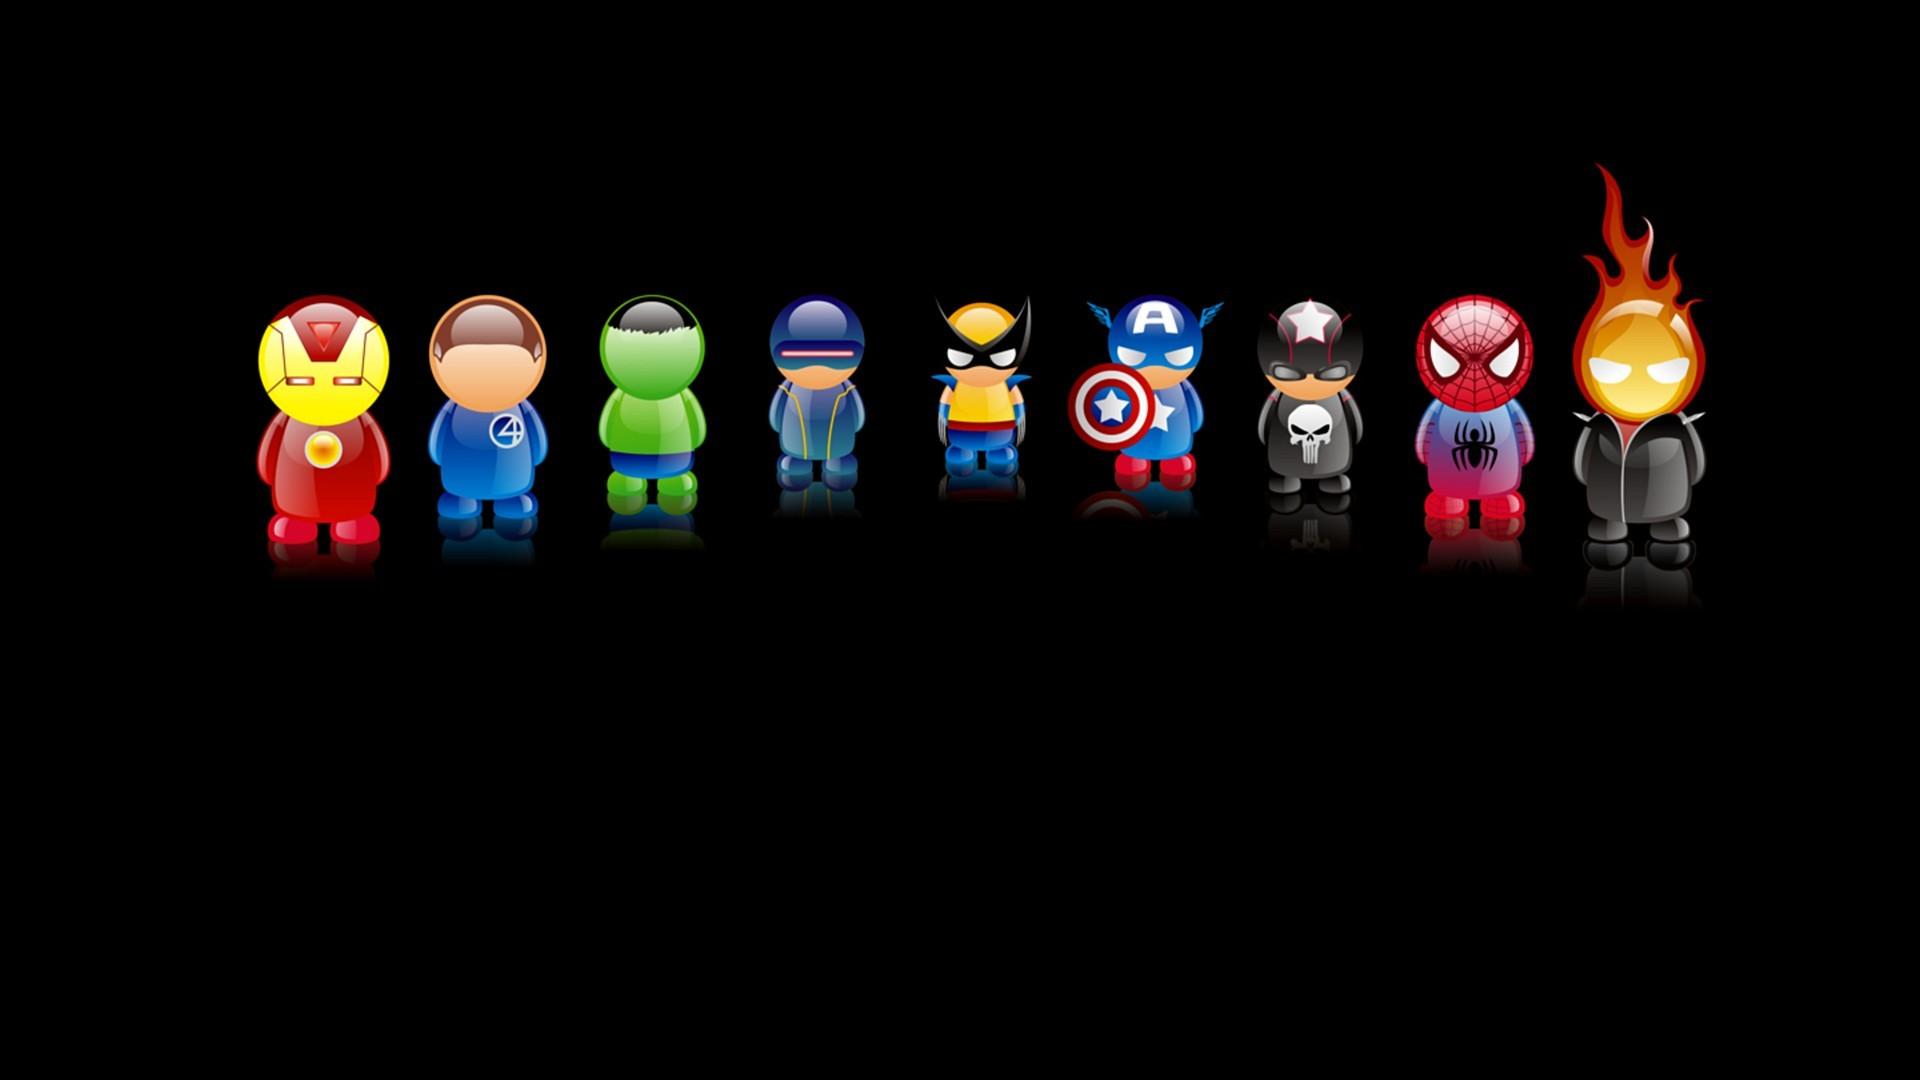 Marvel super heroes wallpaper 71 images 2560x1564 marvel wallpapers cool hd voltagebd Images